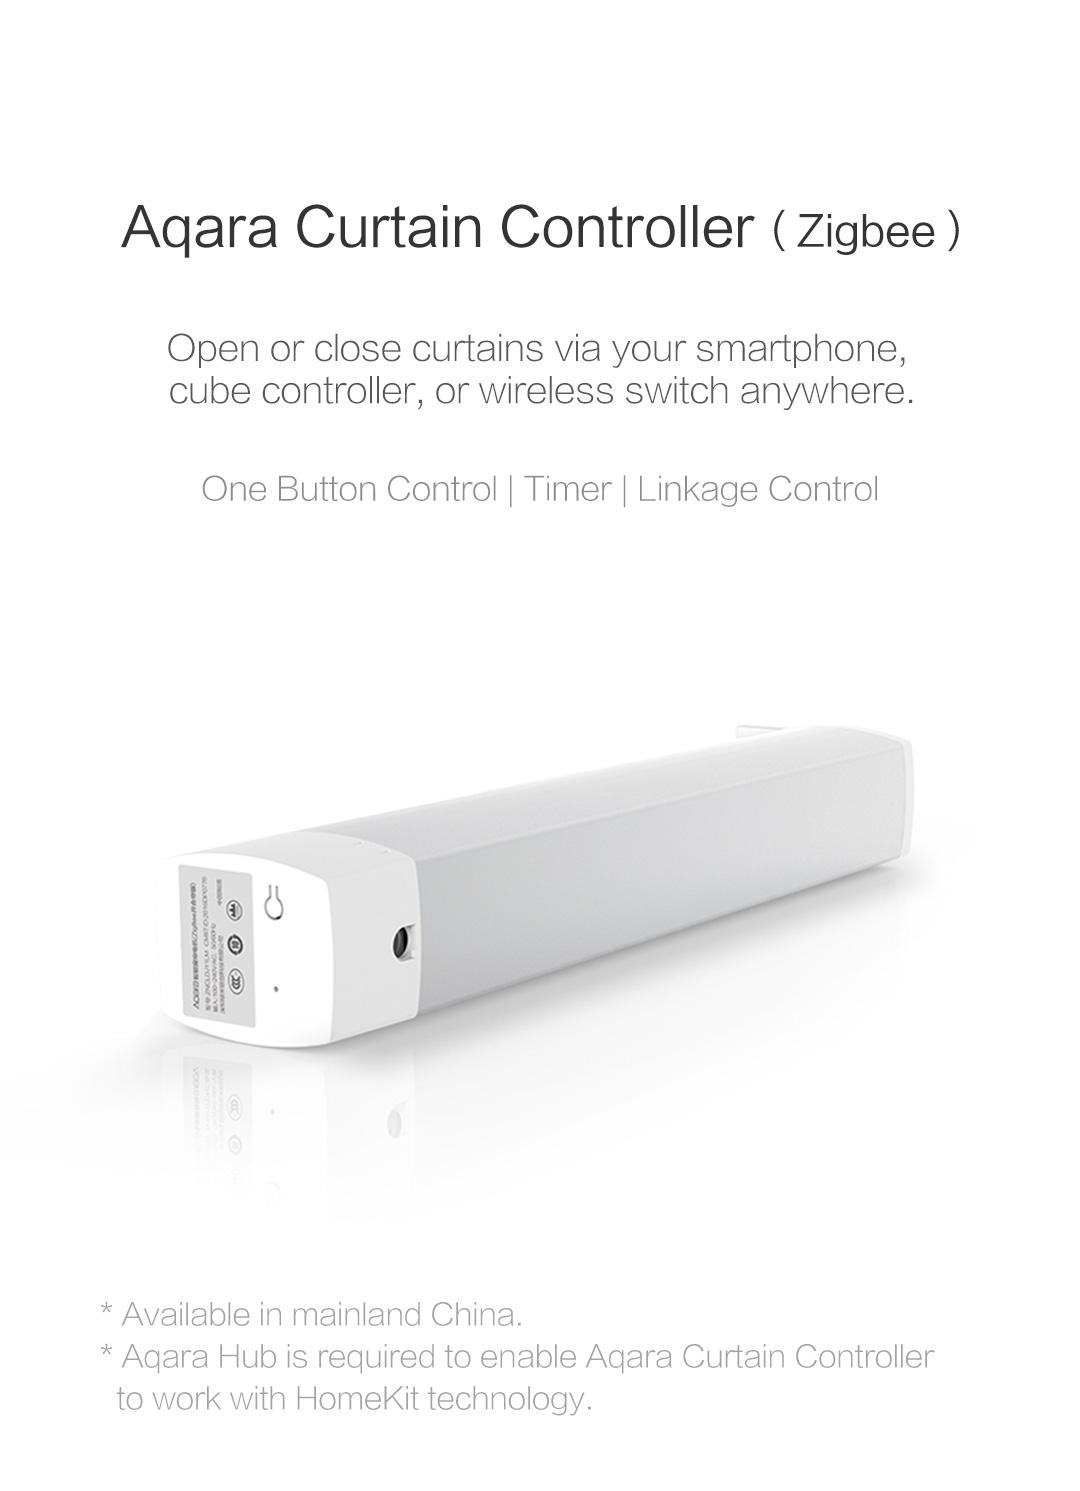 Aqara smart curtain controller - intelligent curtain motor that works with Apple HomeKit